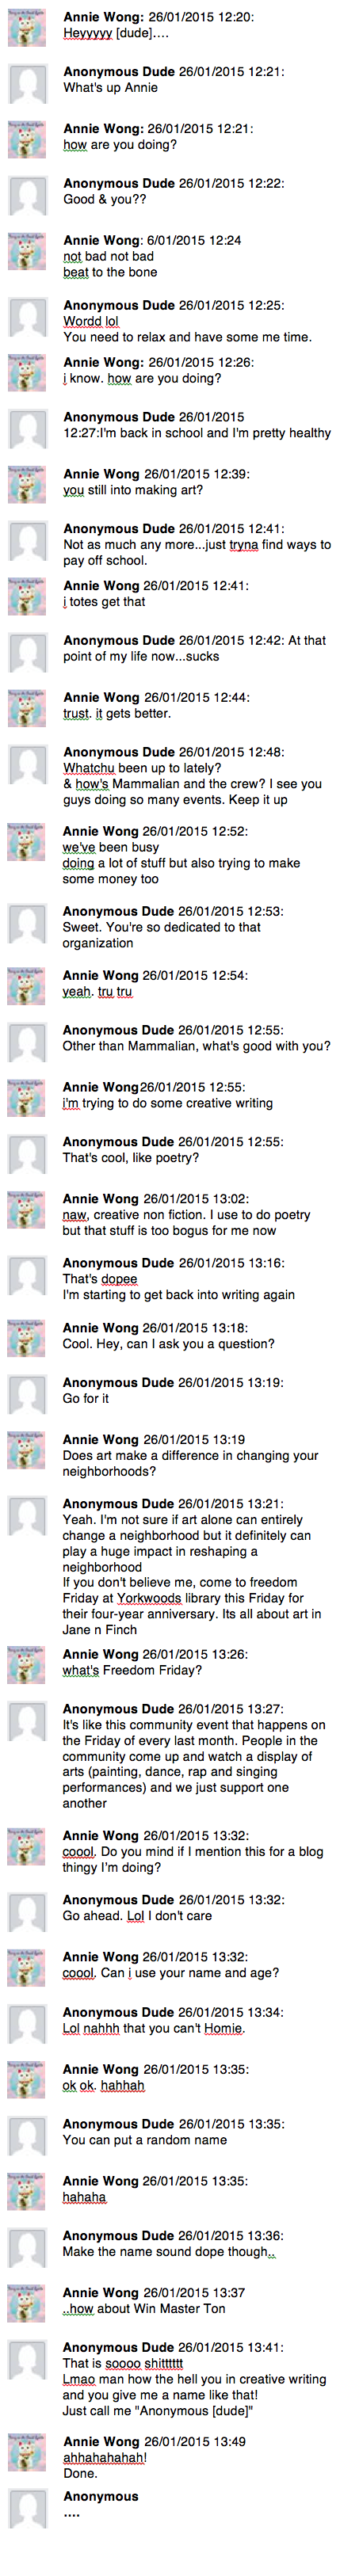 Anonymous Dude